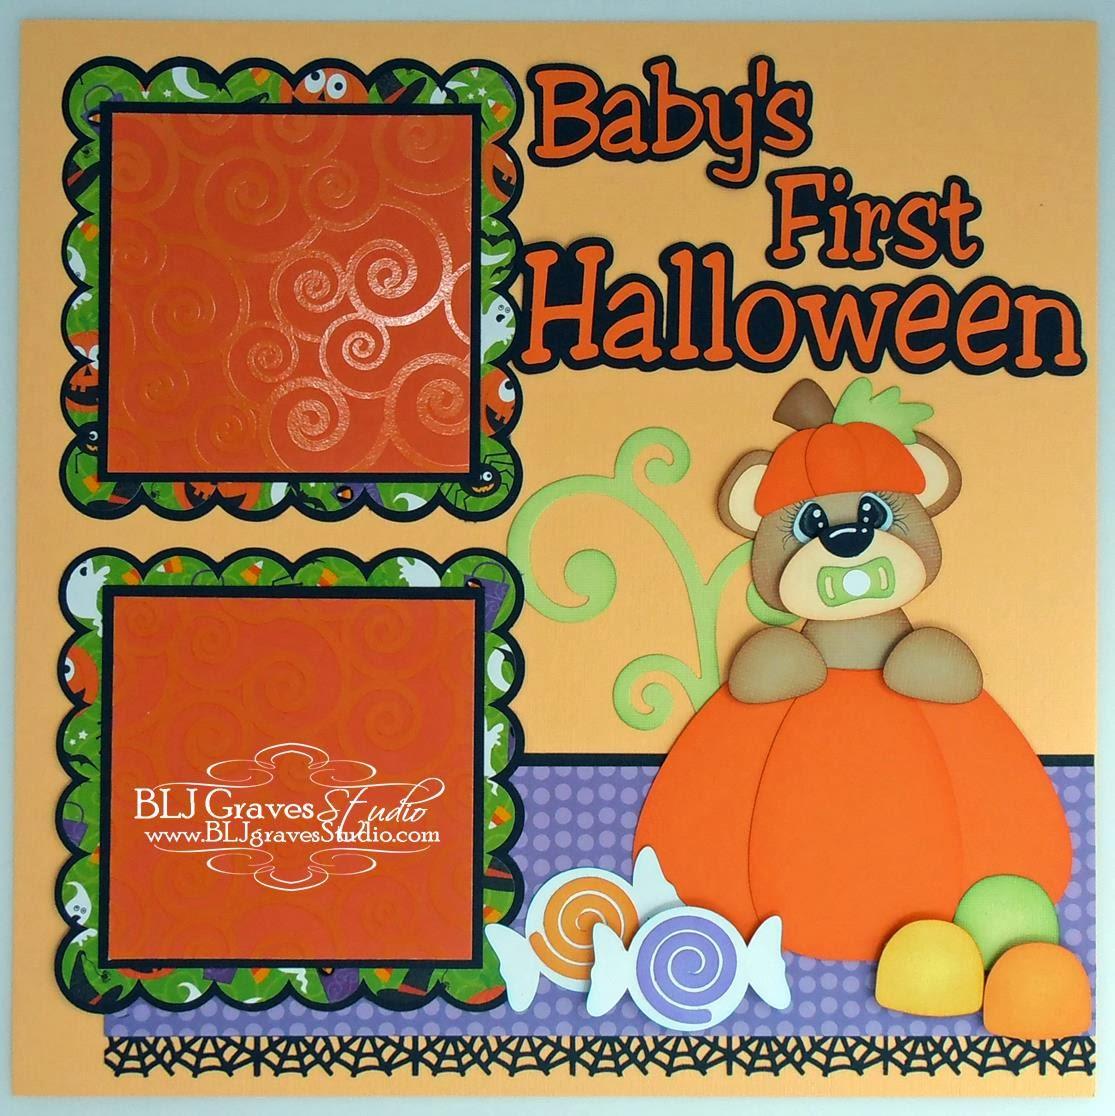 blj graves studio: baby's first halloween scrapbook page